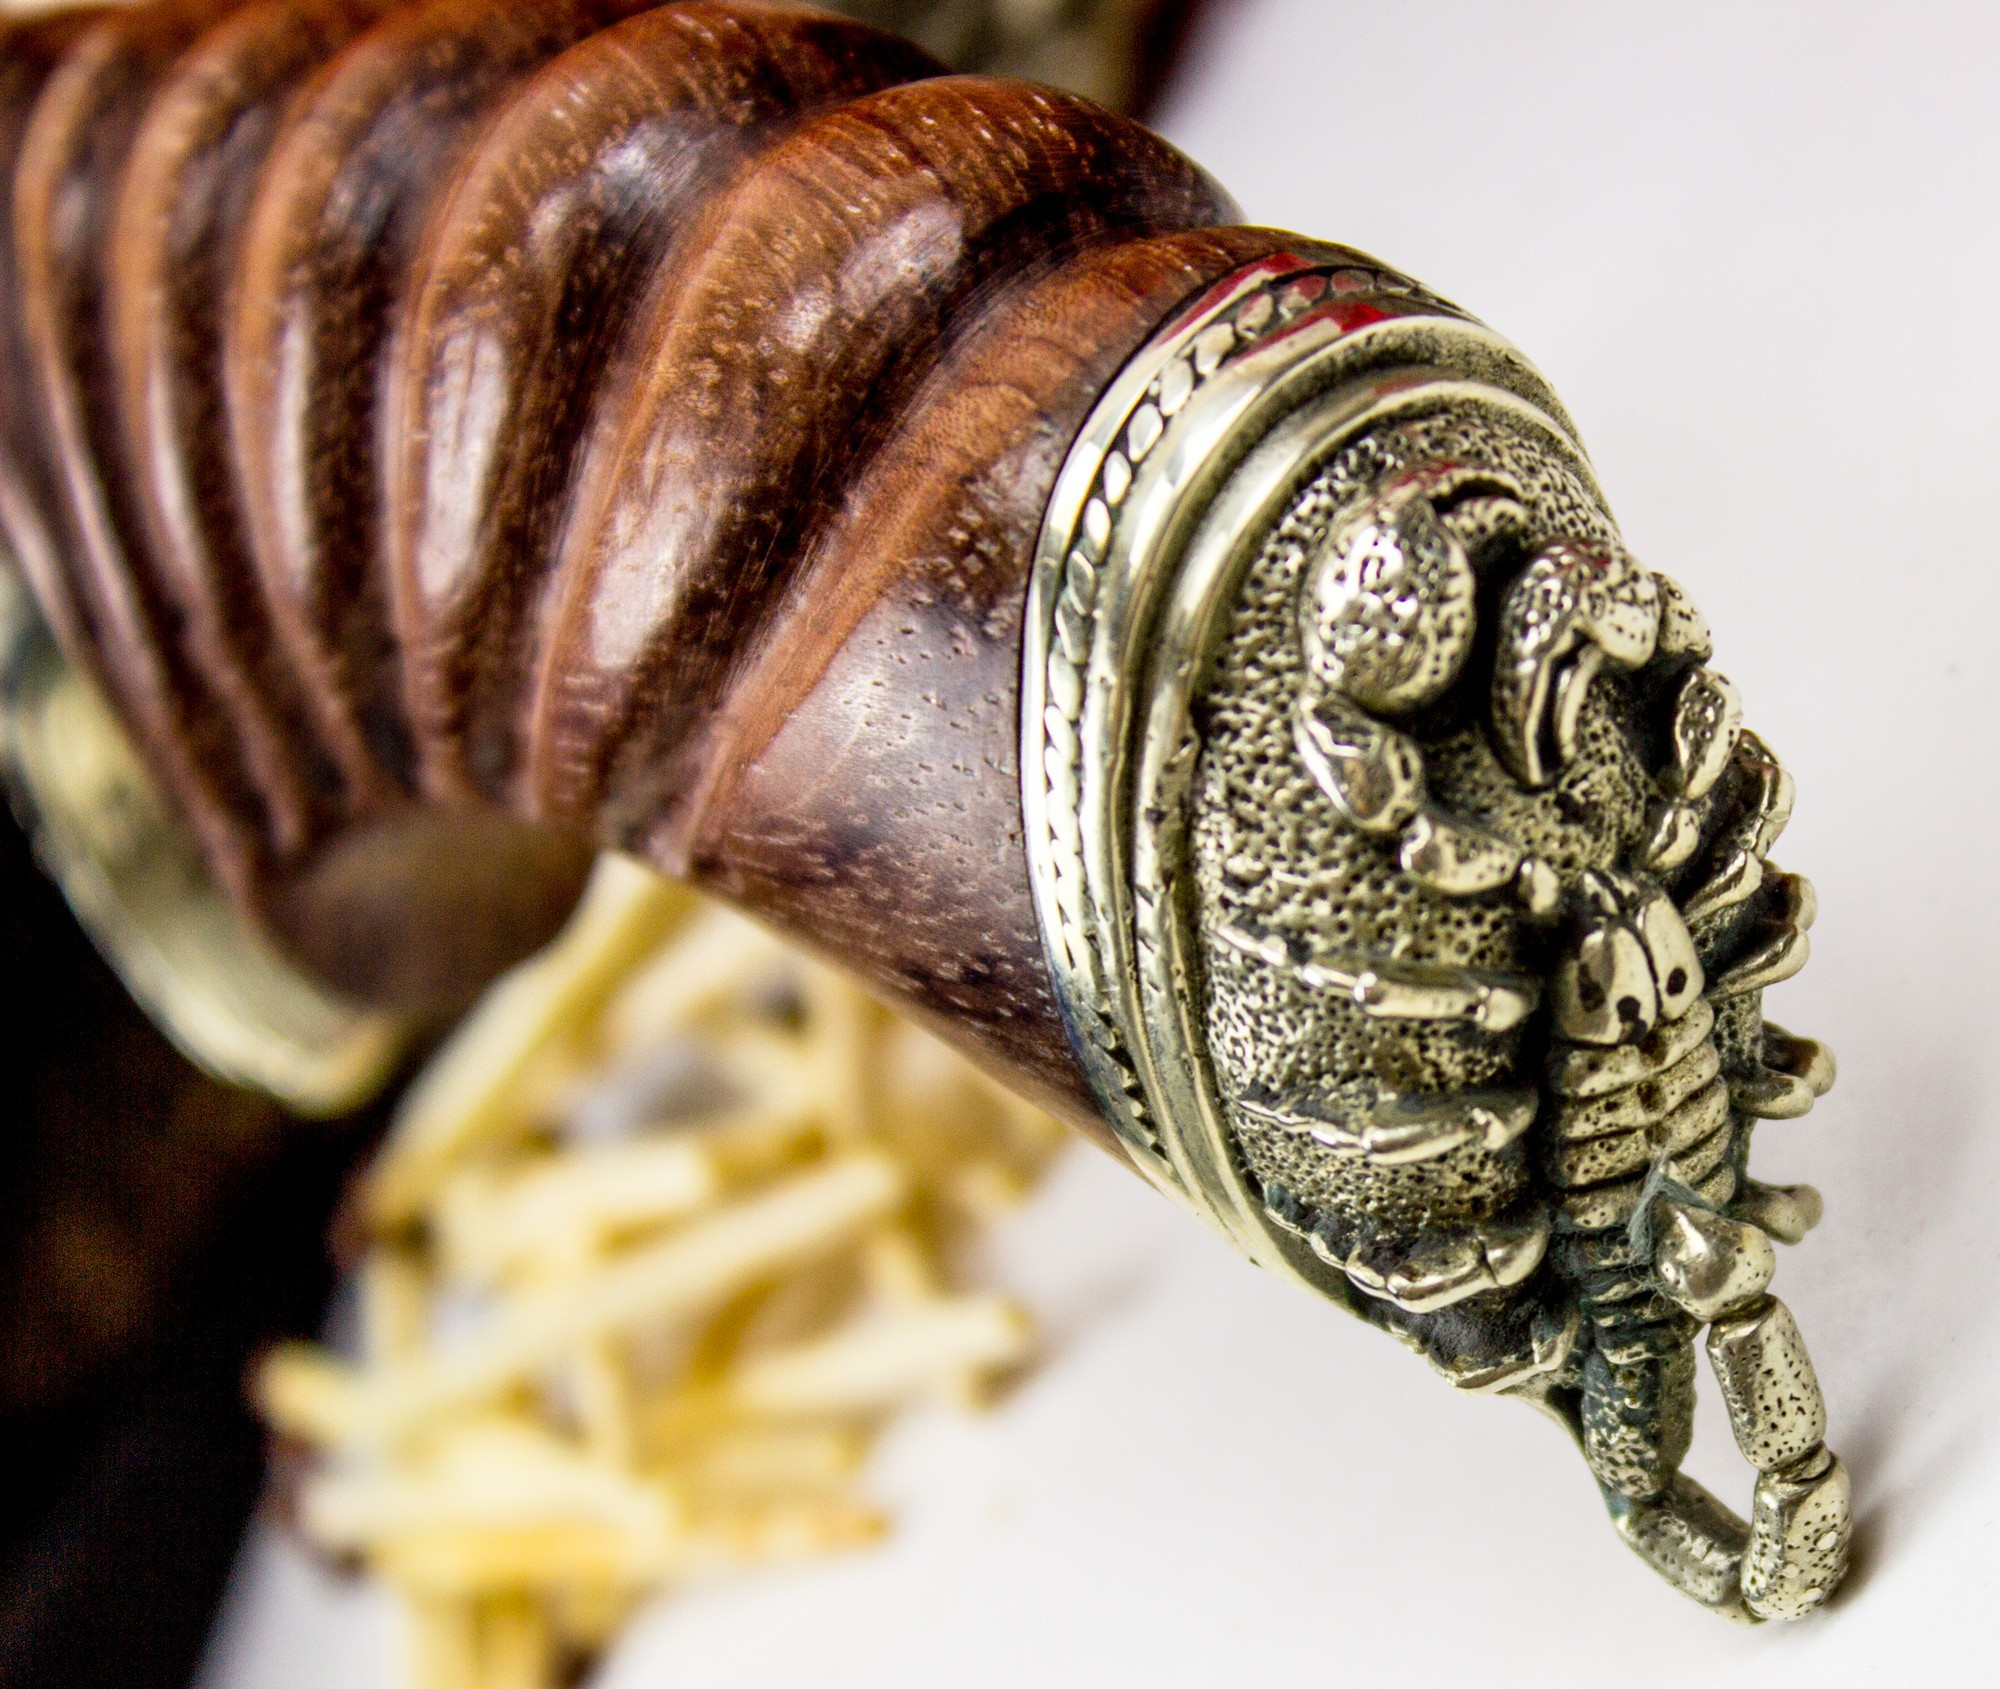 Фото 4 - Нож Корсар с резной рукоятью , дамасская сталь от Кузница Семина